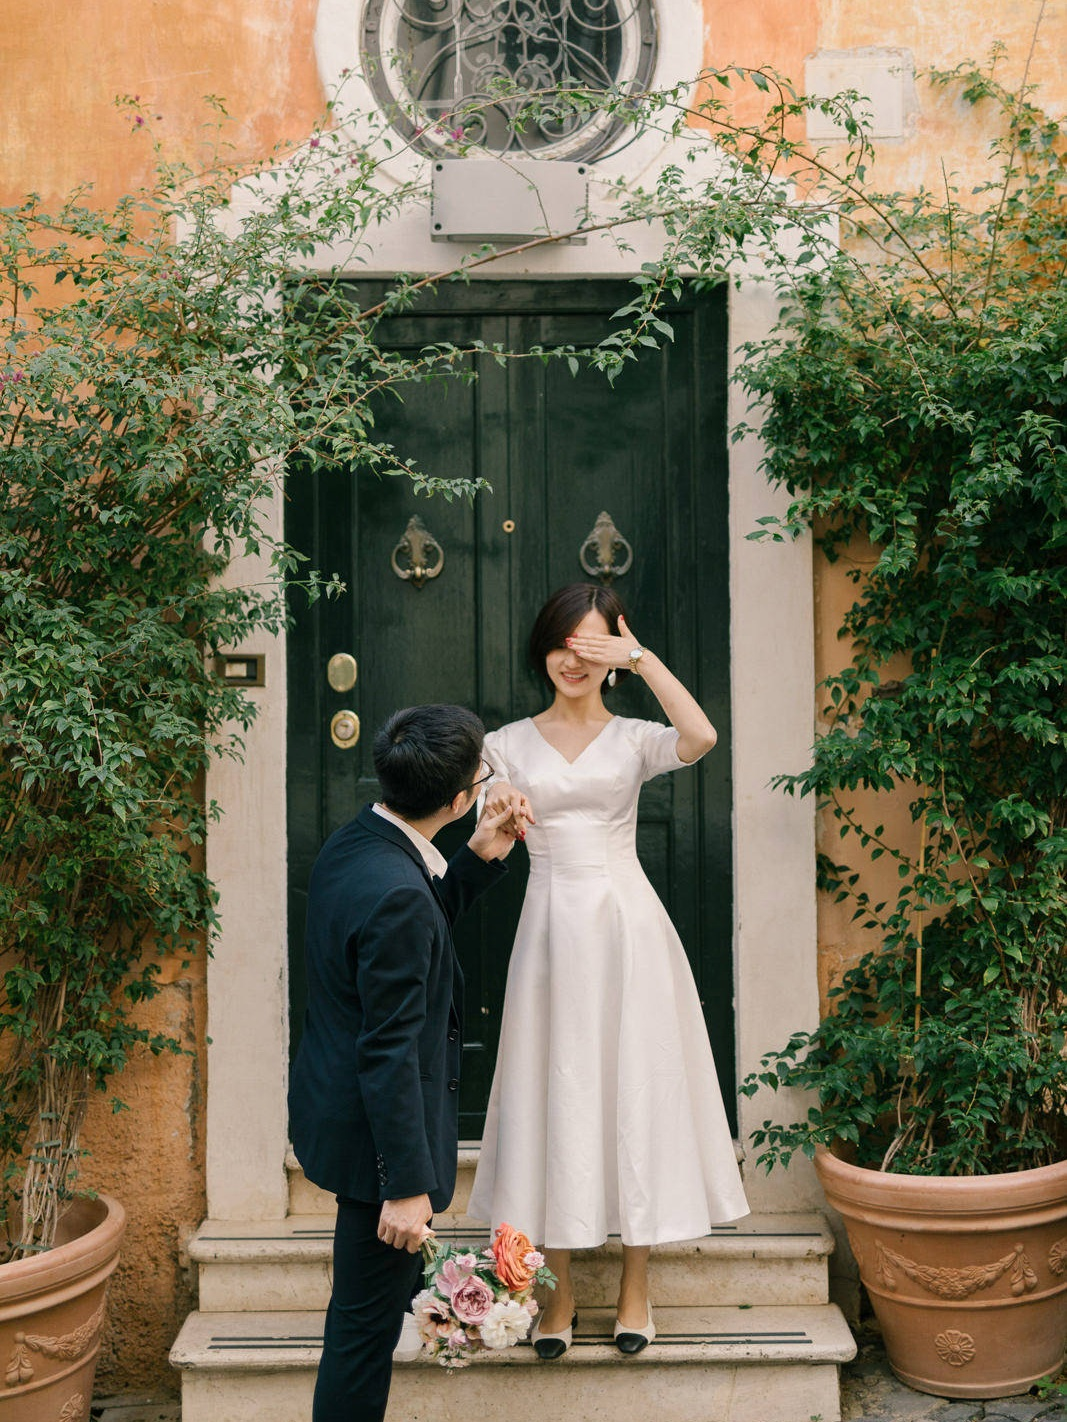 030_rome_engagement_prewedding_session_chymo_more_photography.jpg